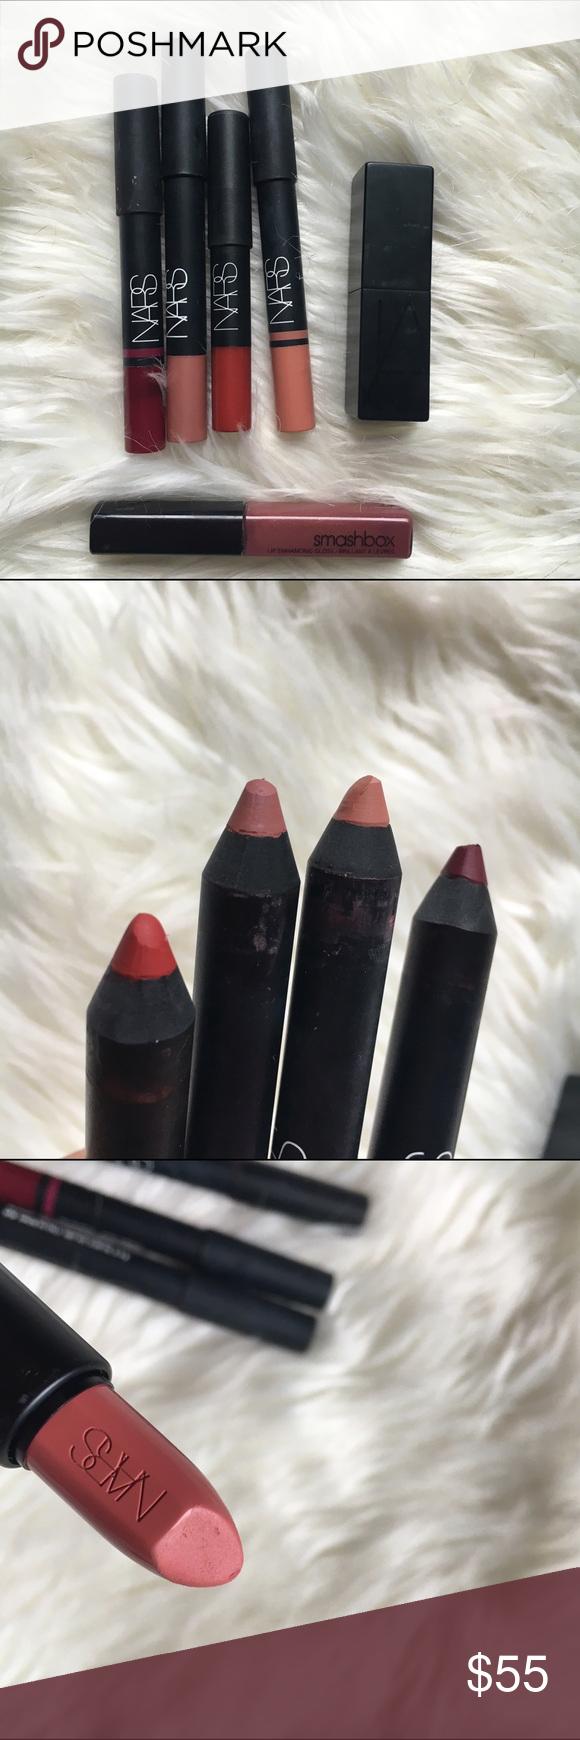 Nars Lipstick BundleNWT | D, Lipsticks and Beautiful